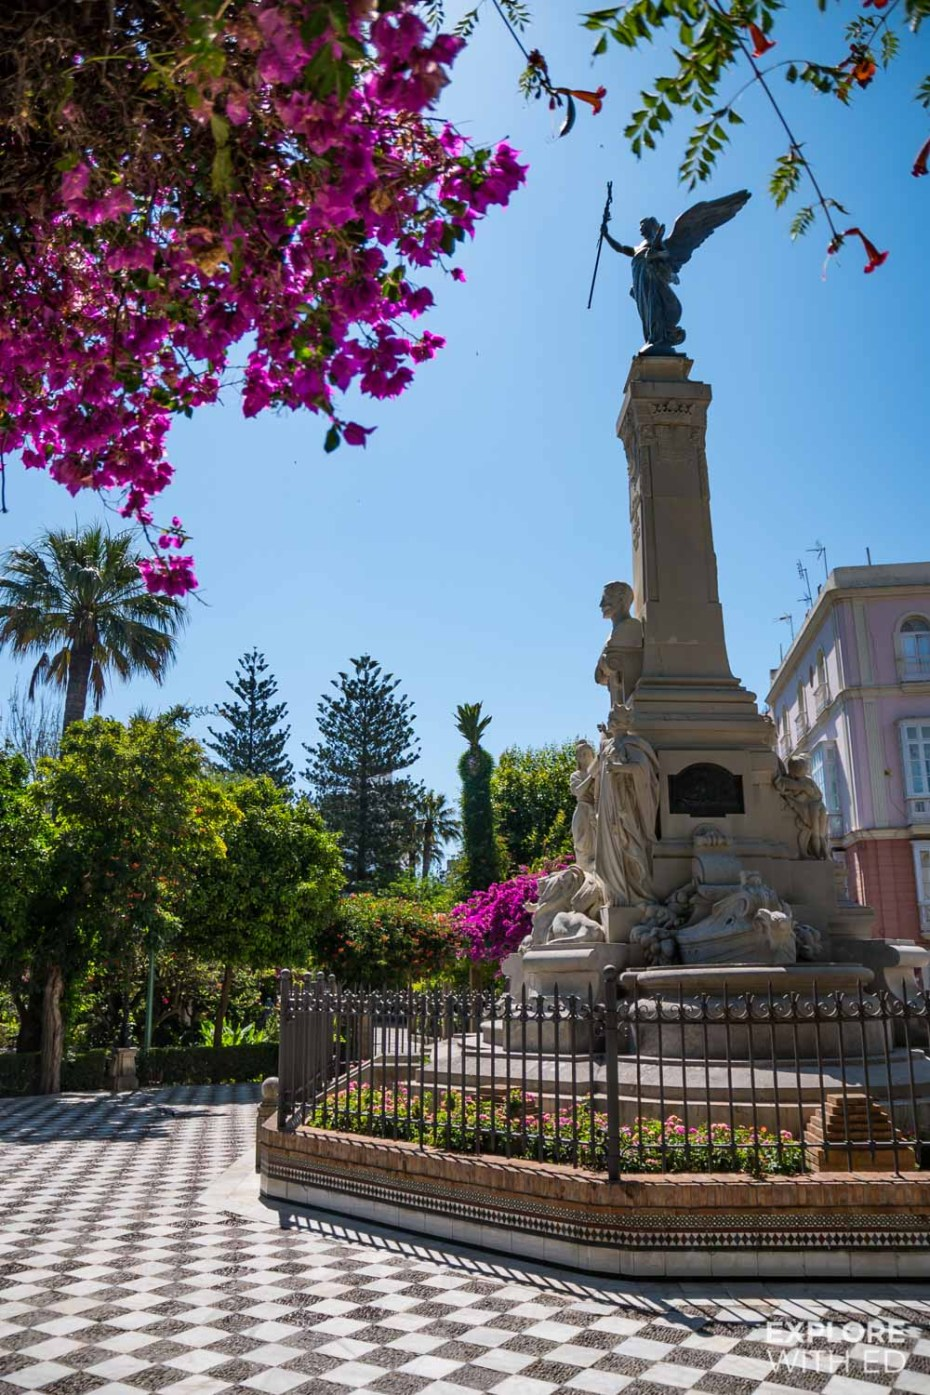 Colourful gardens of Alameda Apodaca